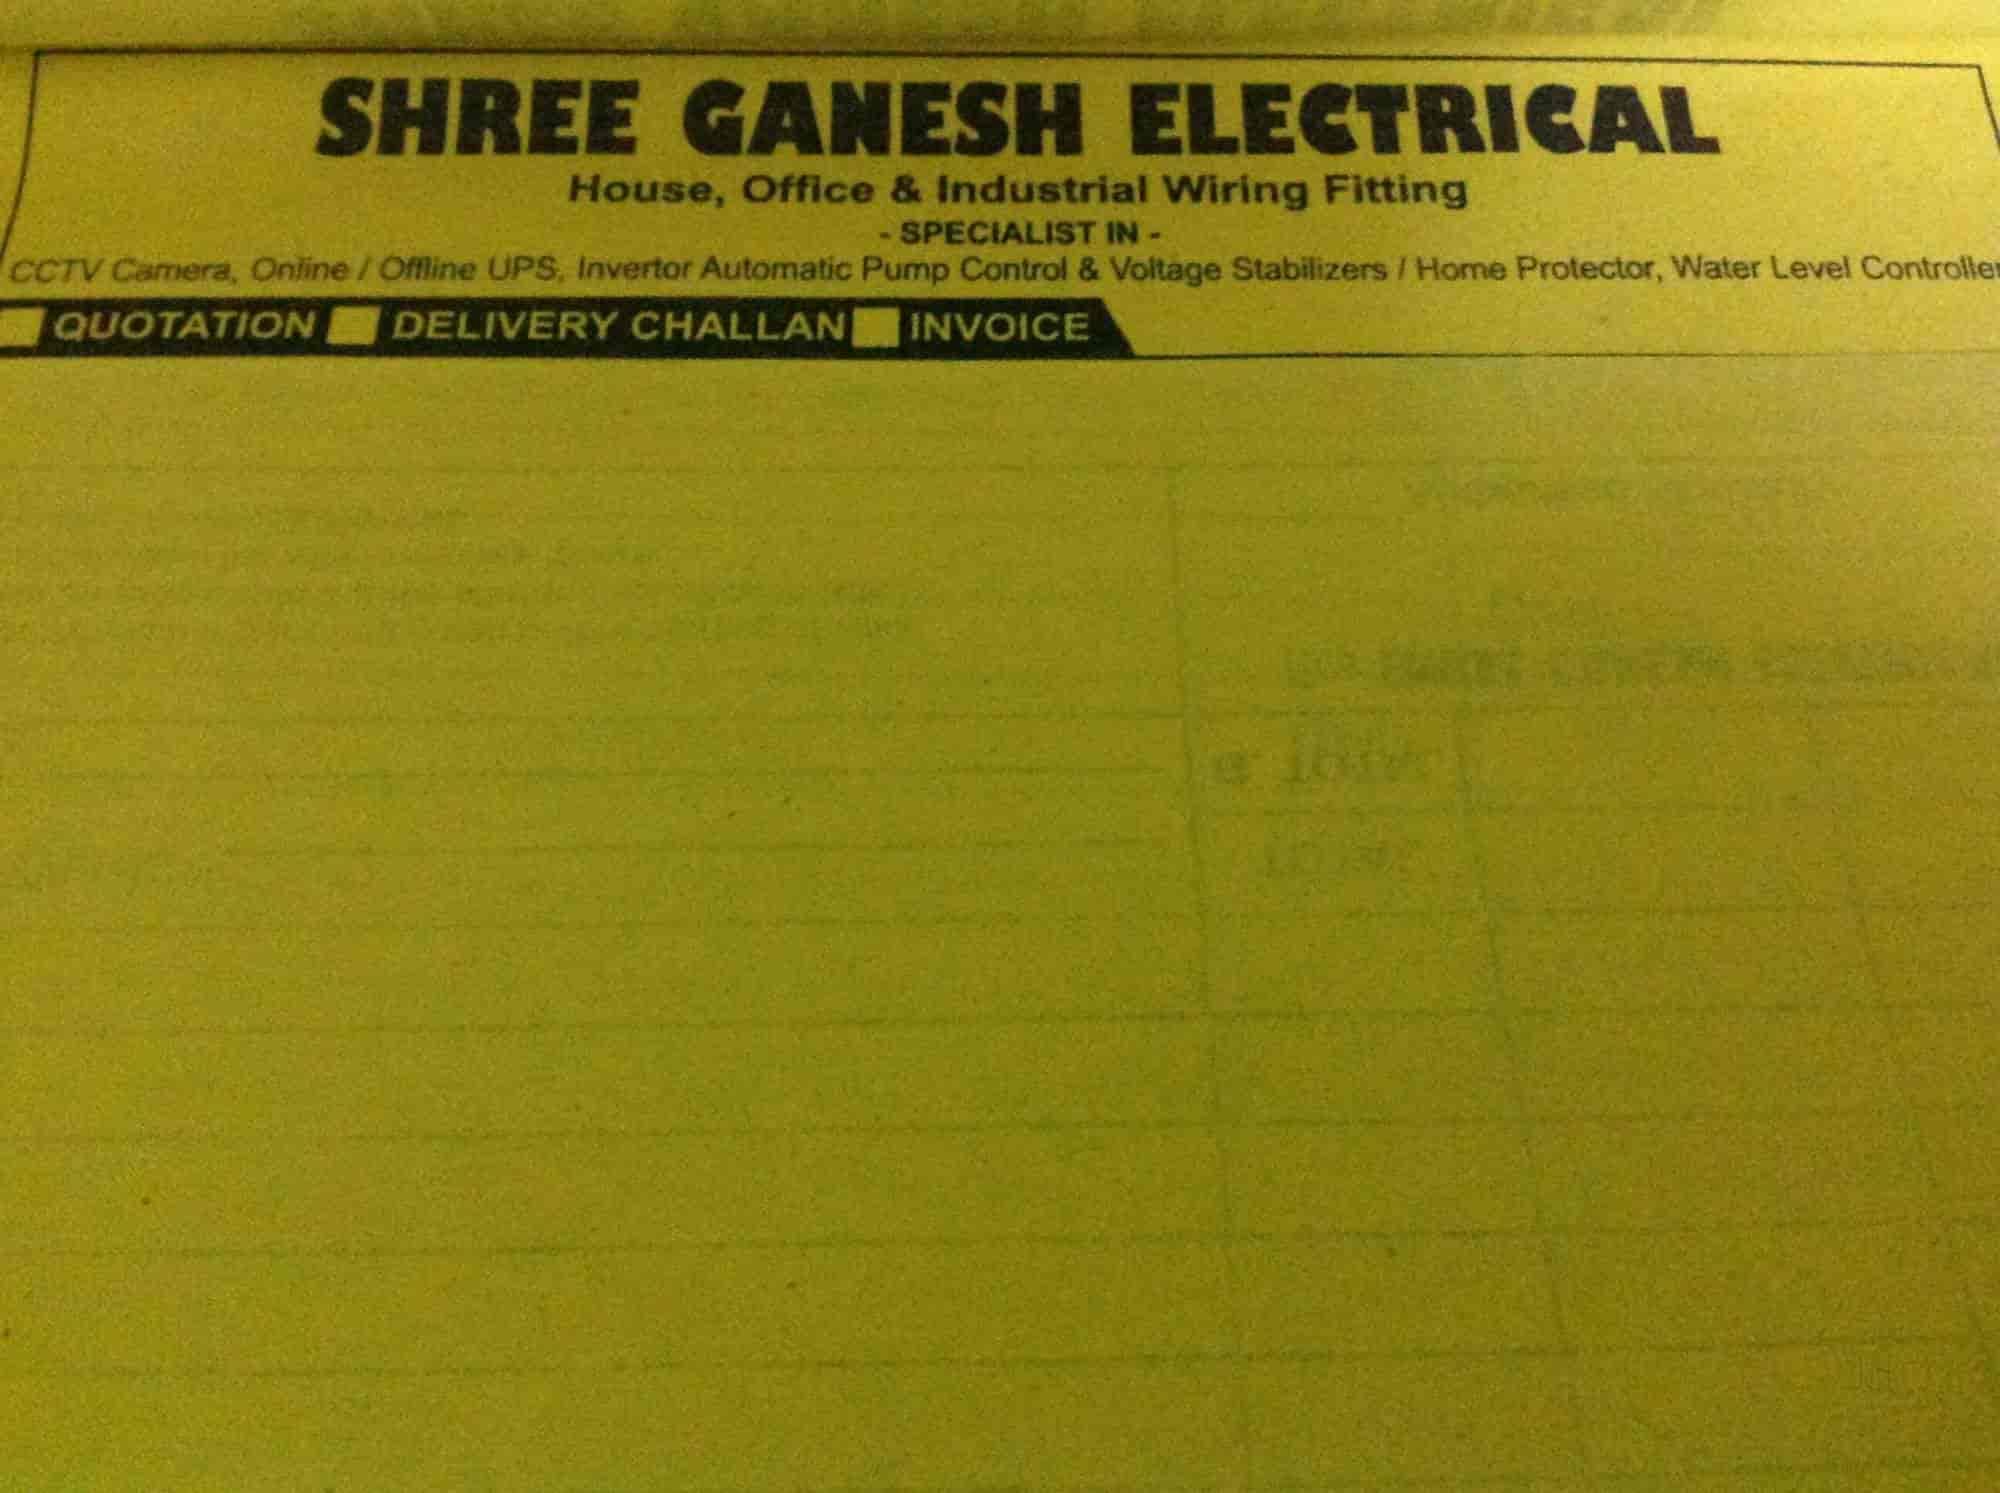 Shree Ganesh Electricals Nigdi Pradhikaran Akurdi Pimpri Chinchwad Electrical House Wiring Quotation Services In Pune Justdial